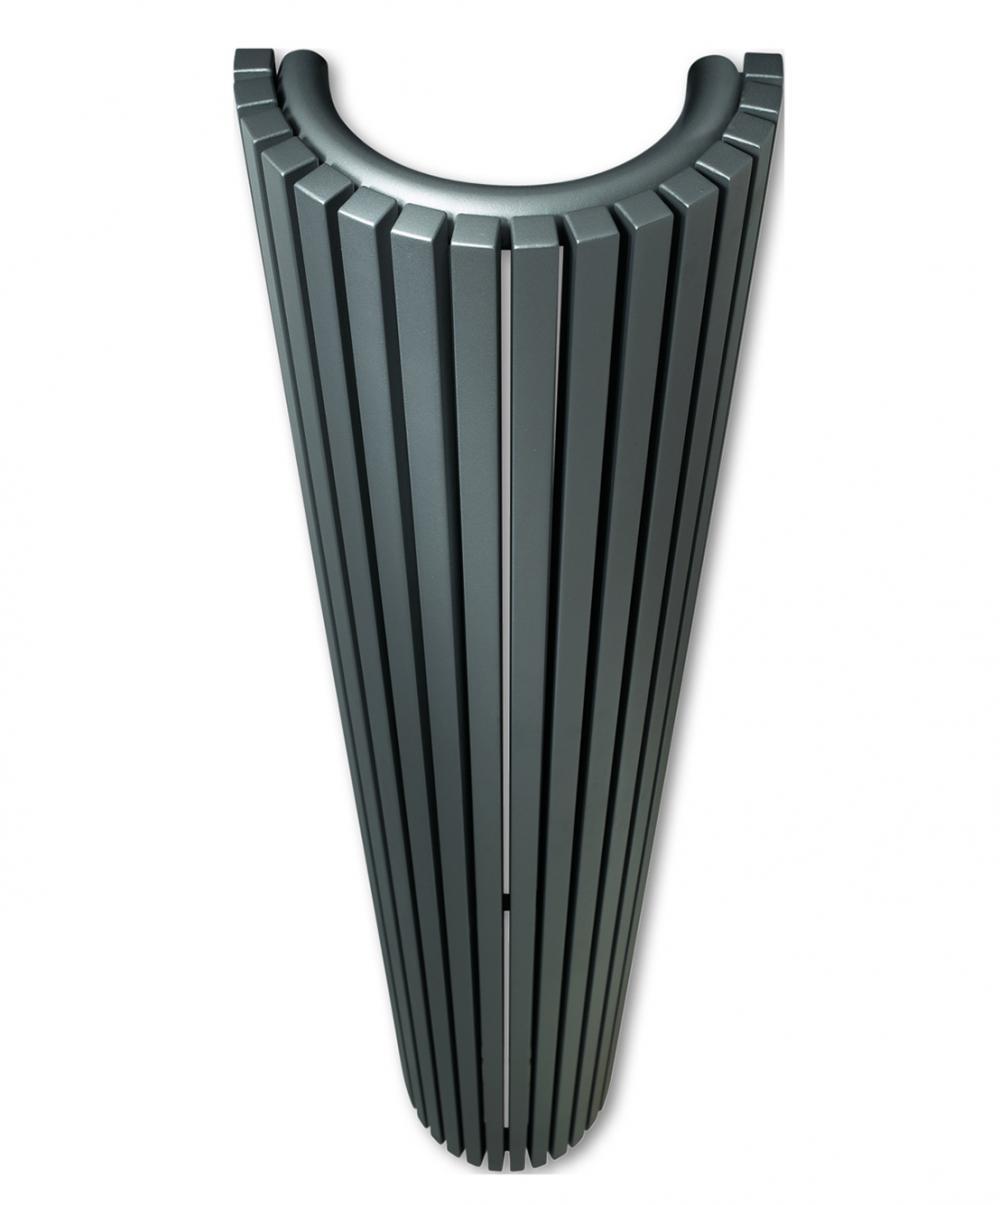 Calorifere decorative semirotunde Vasco Carre CR-O 1800x350 mm, 1528 W